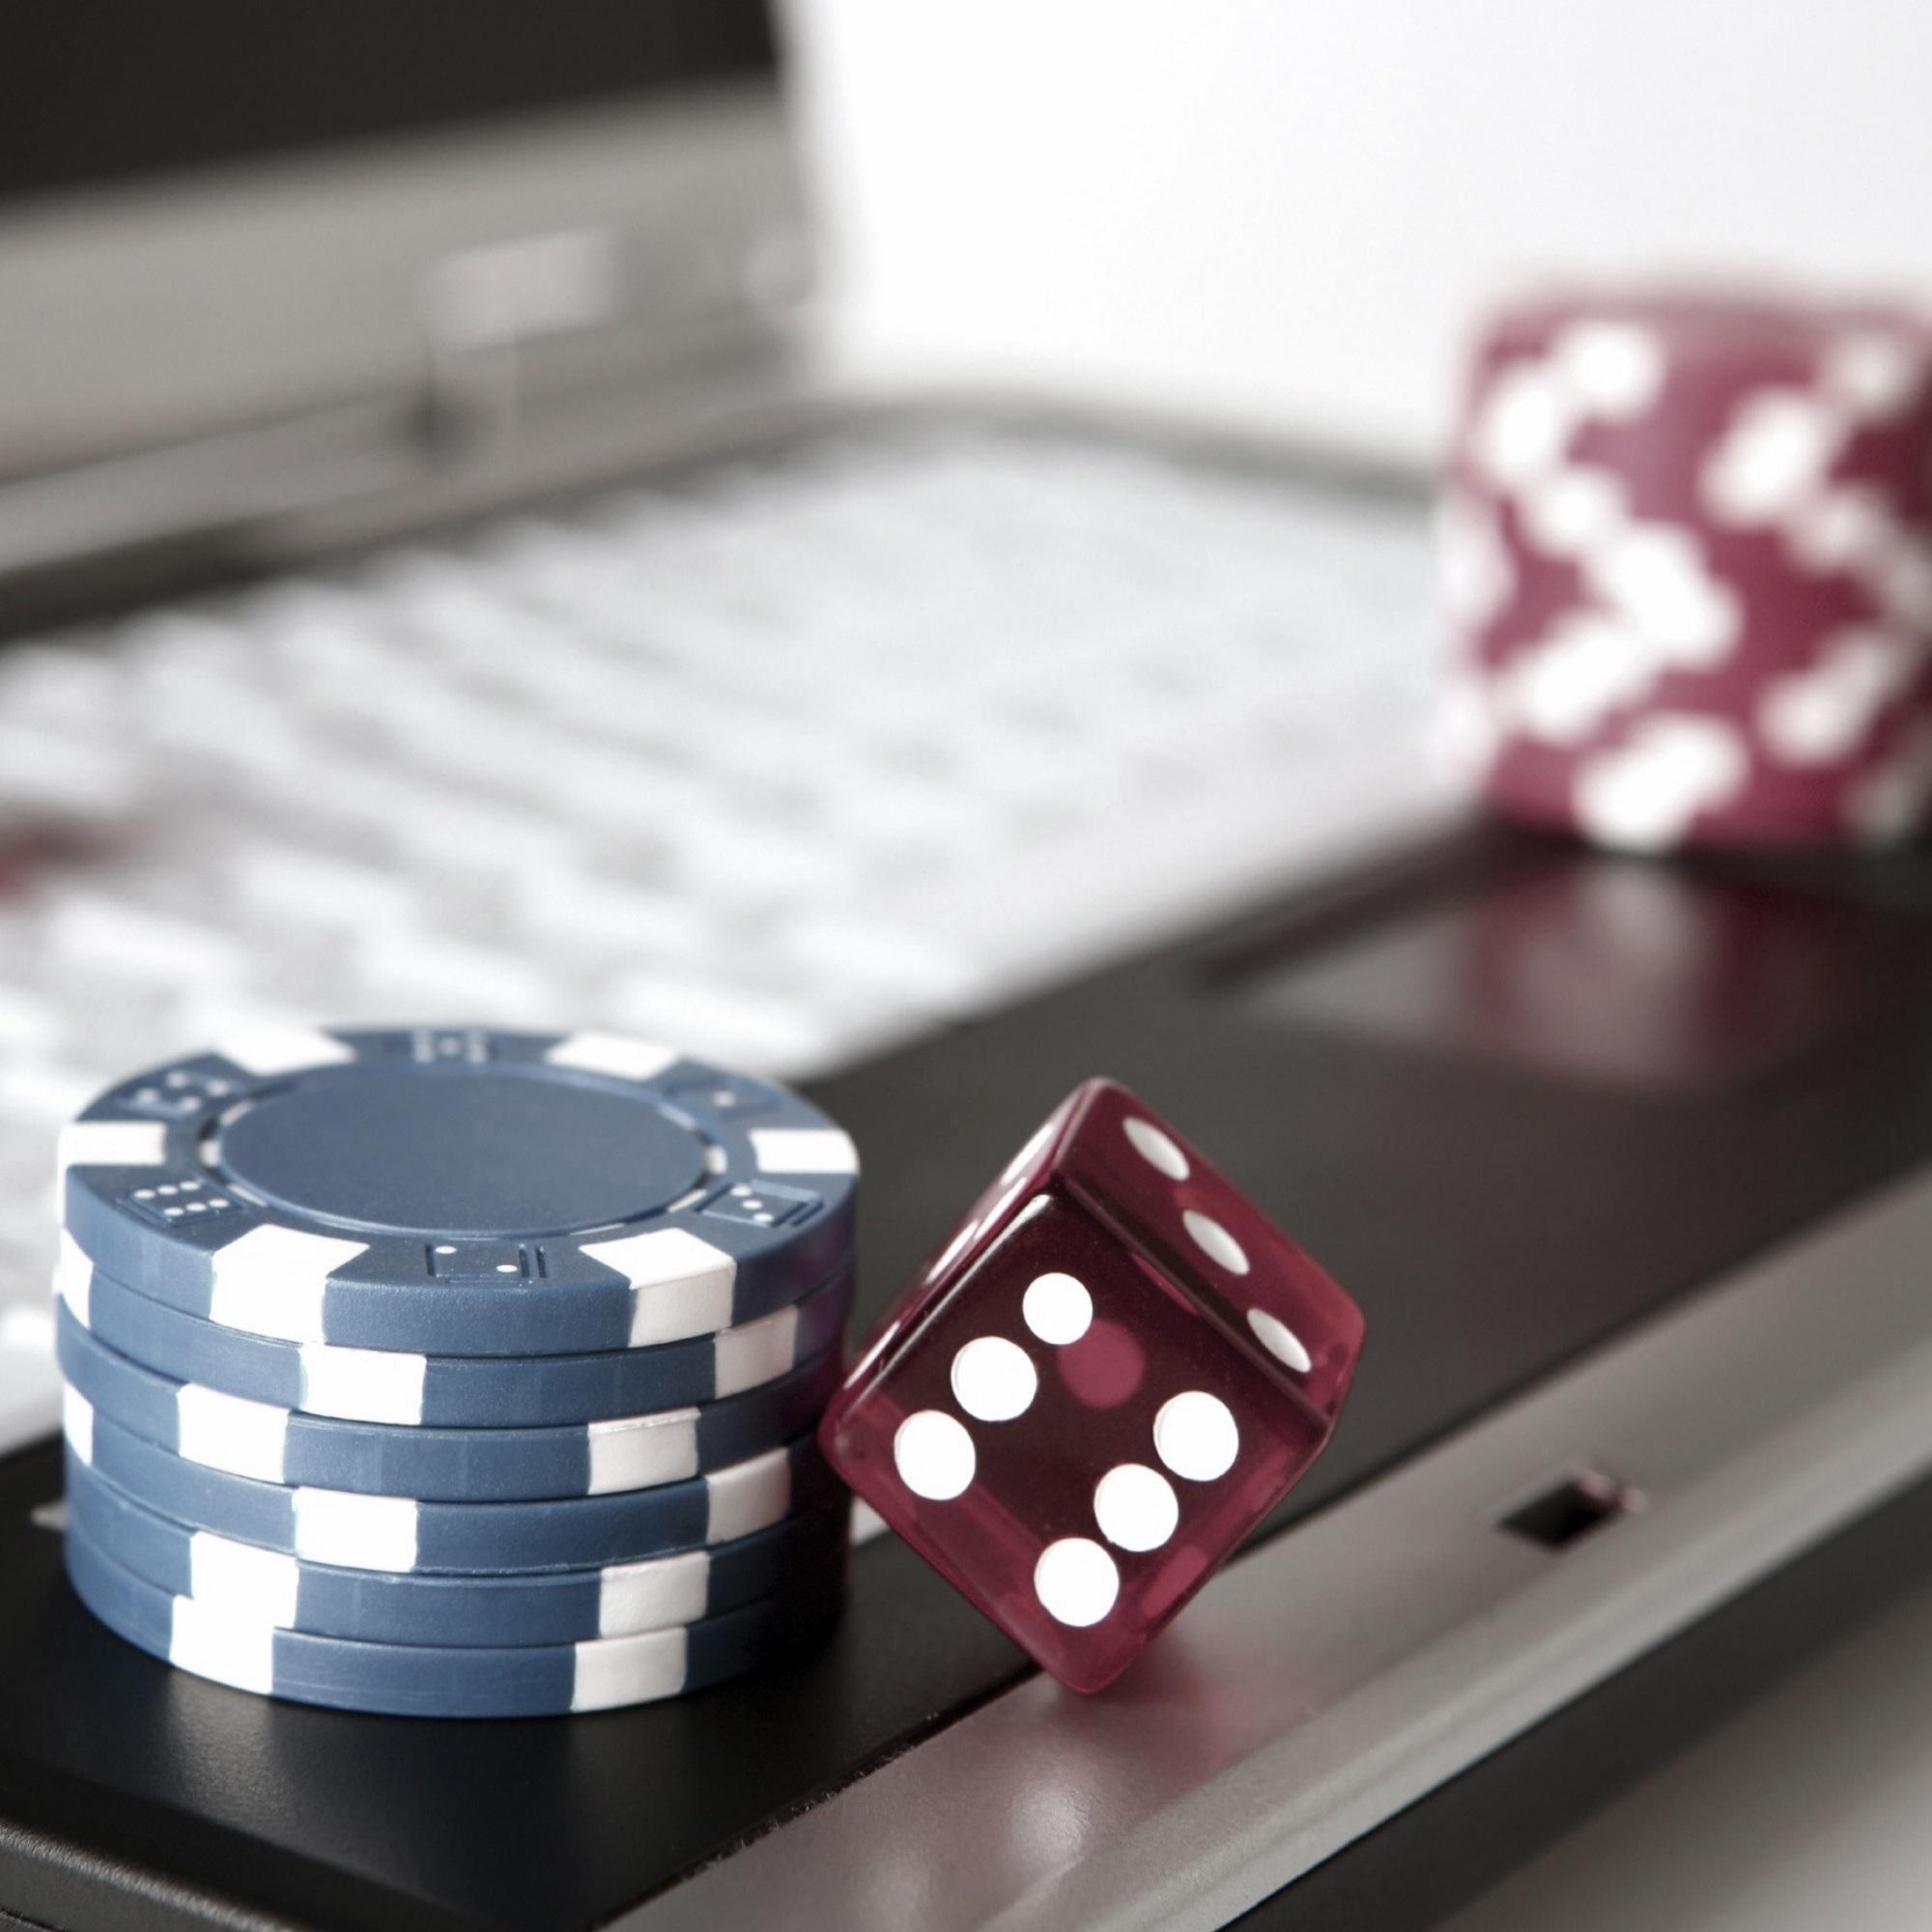 Online Gambling Grows in Every Hour.